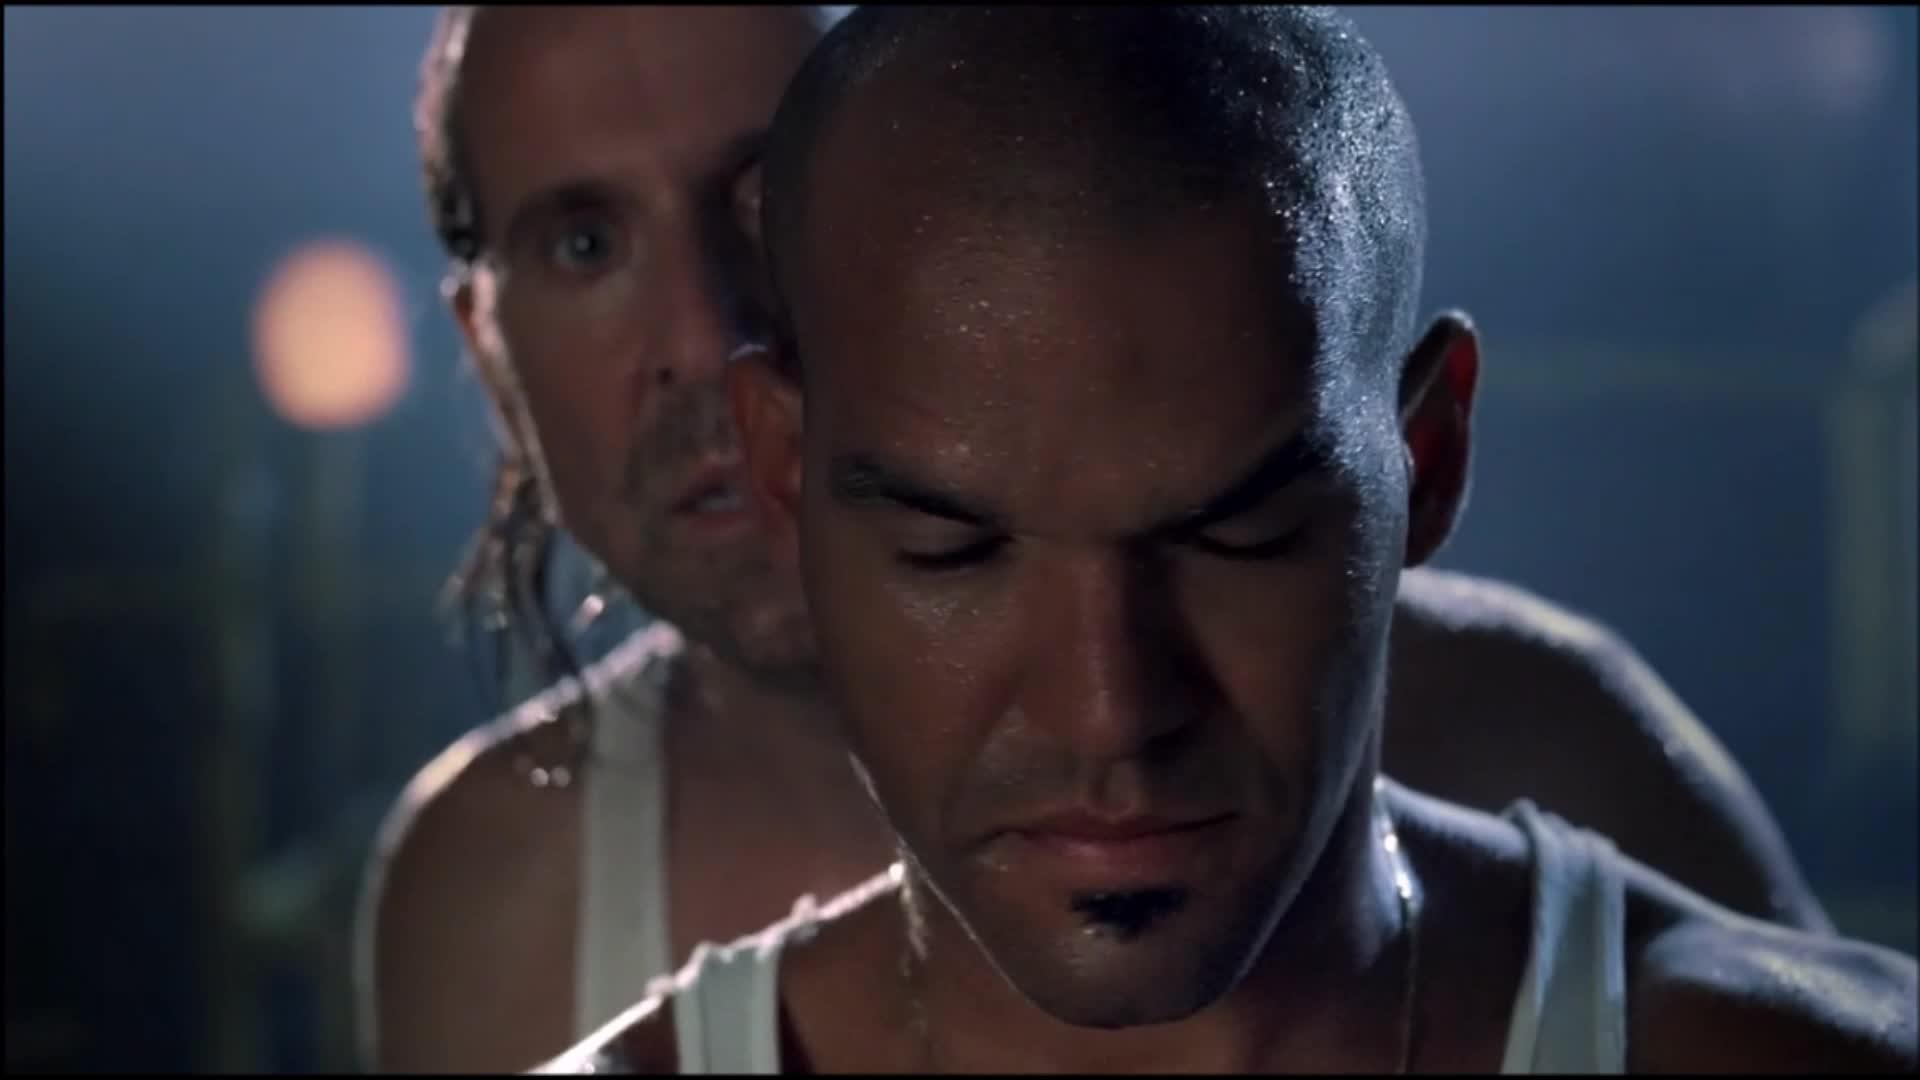 Prison Break - Devil and an Eggbeater